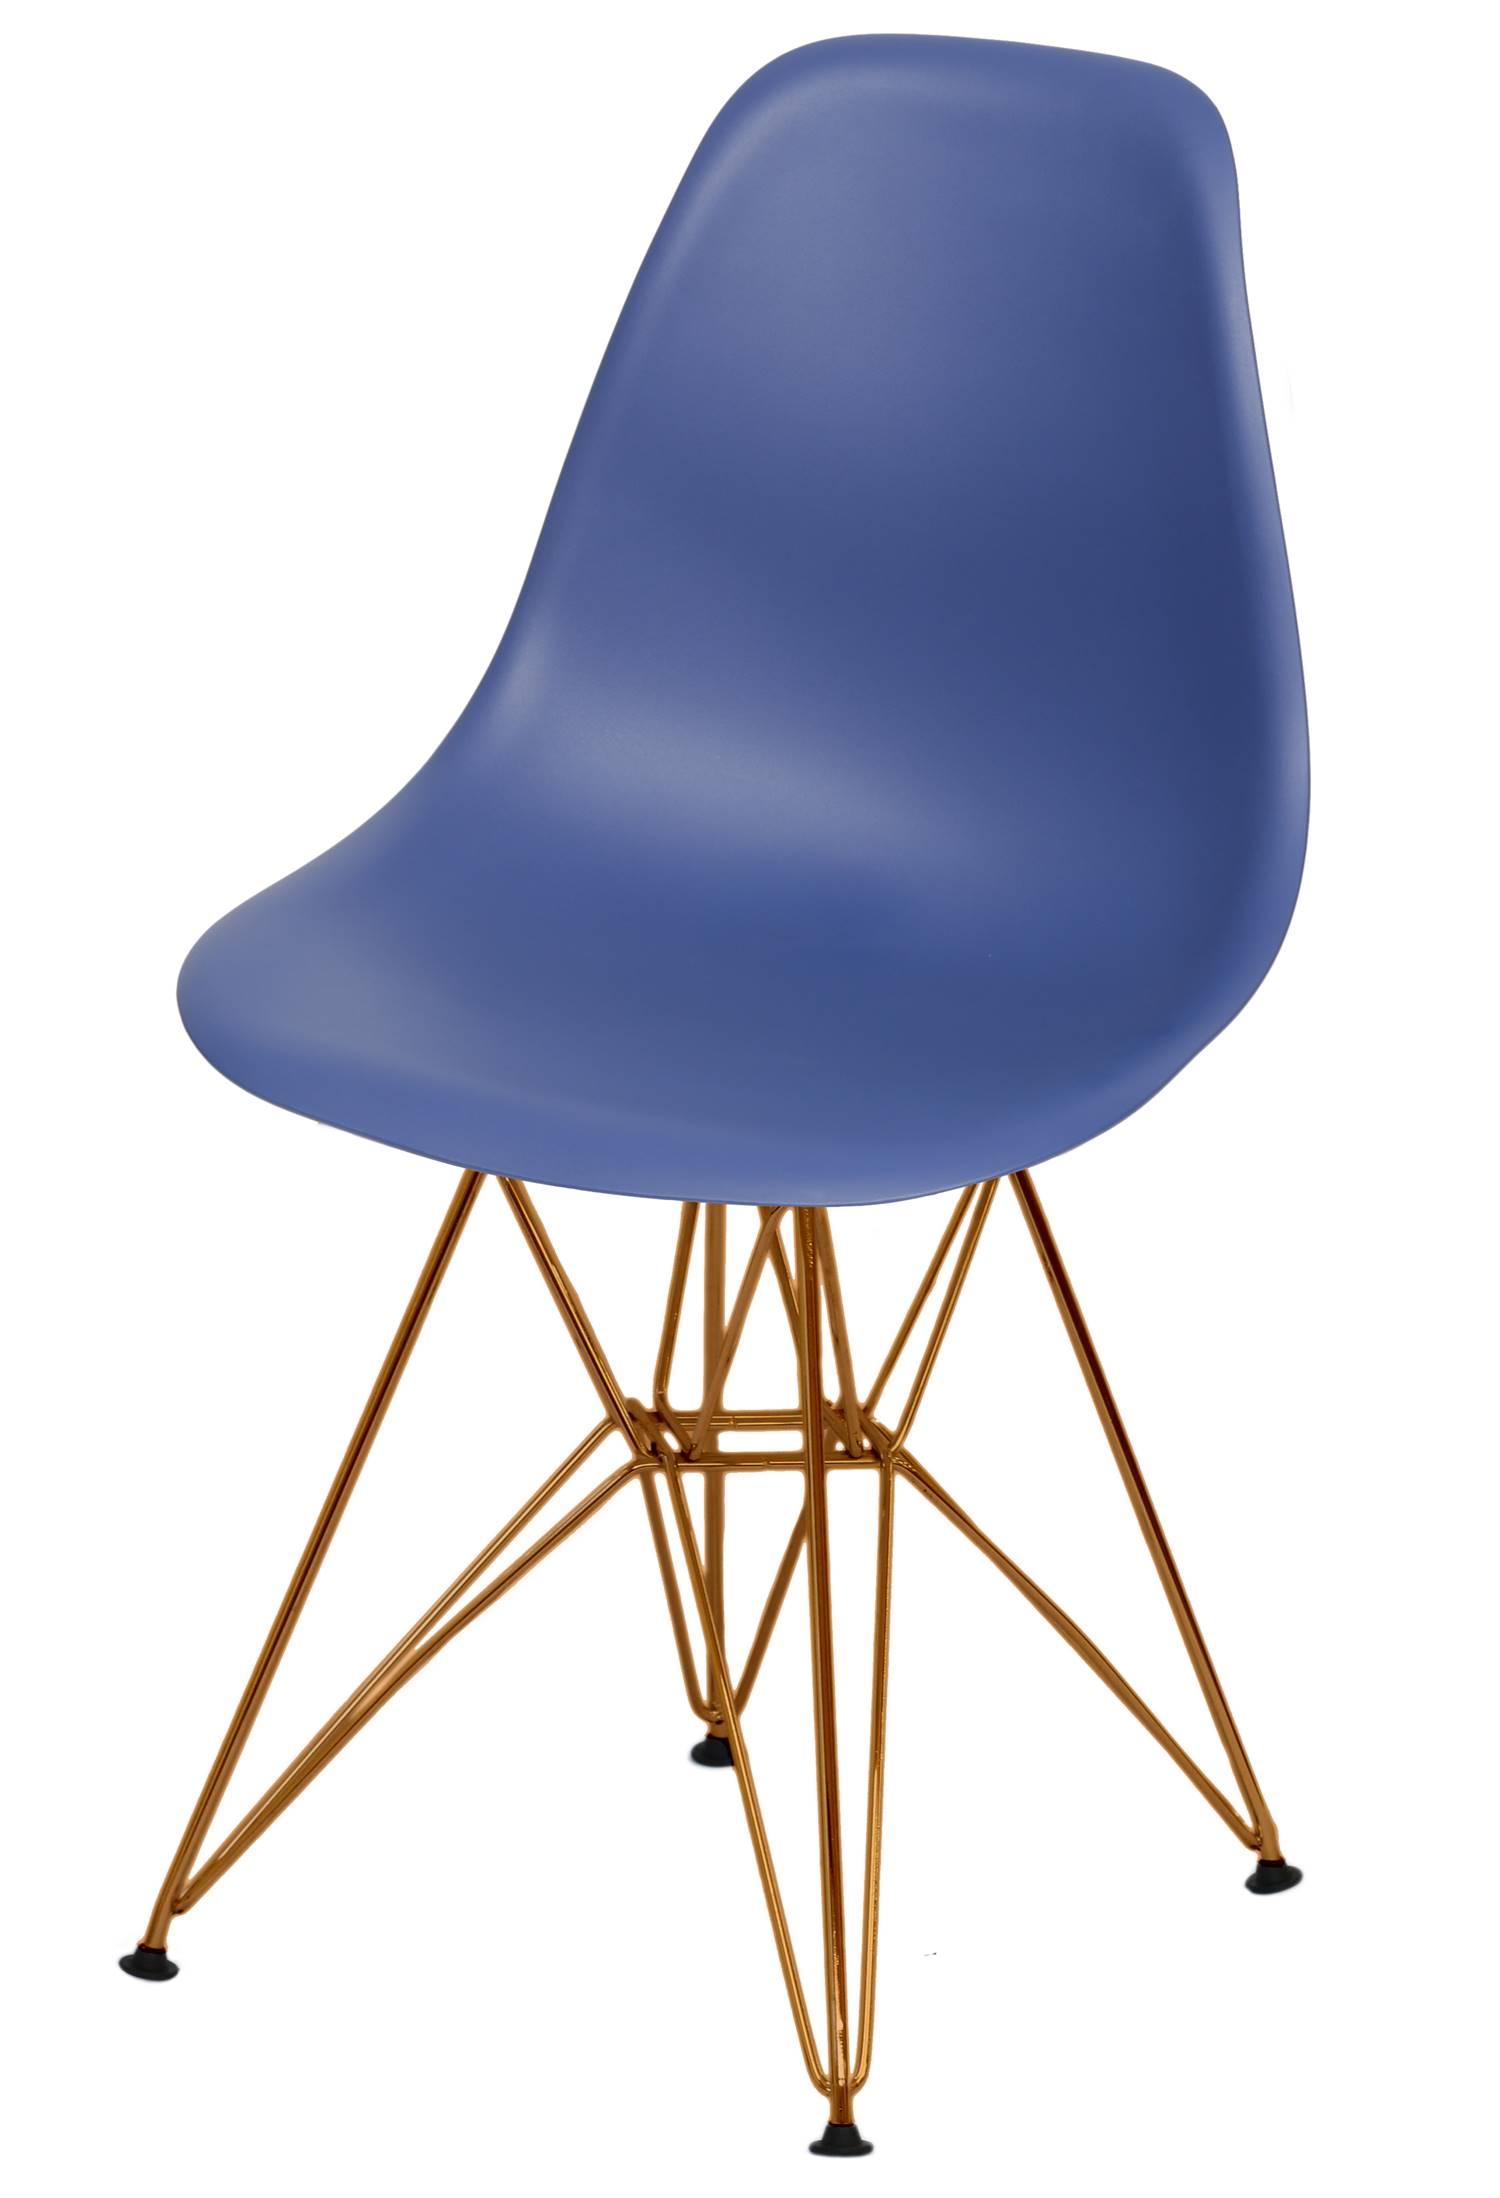 Cadeira Eames Polipropileno Azul Marinho Base Cobre - 49368